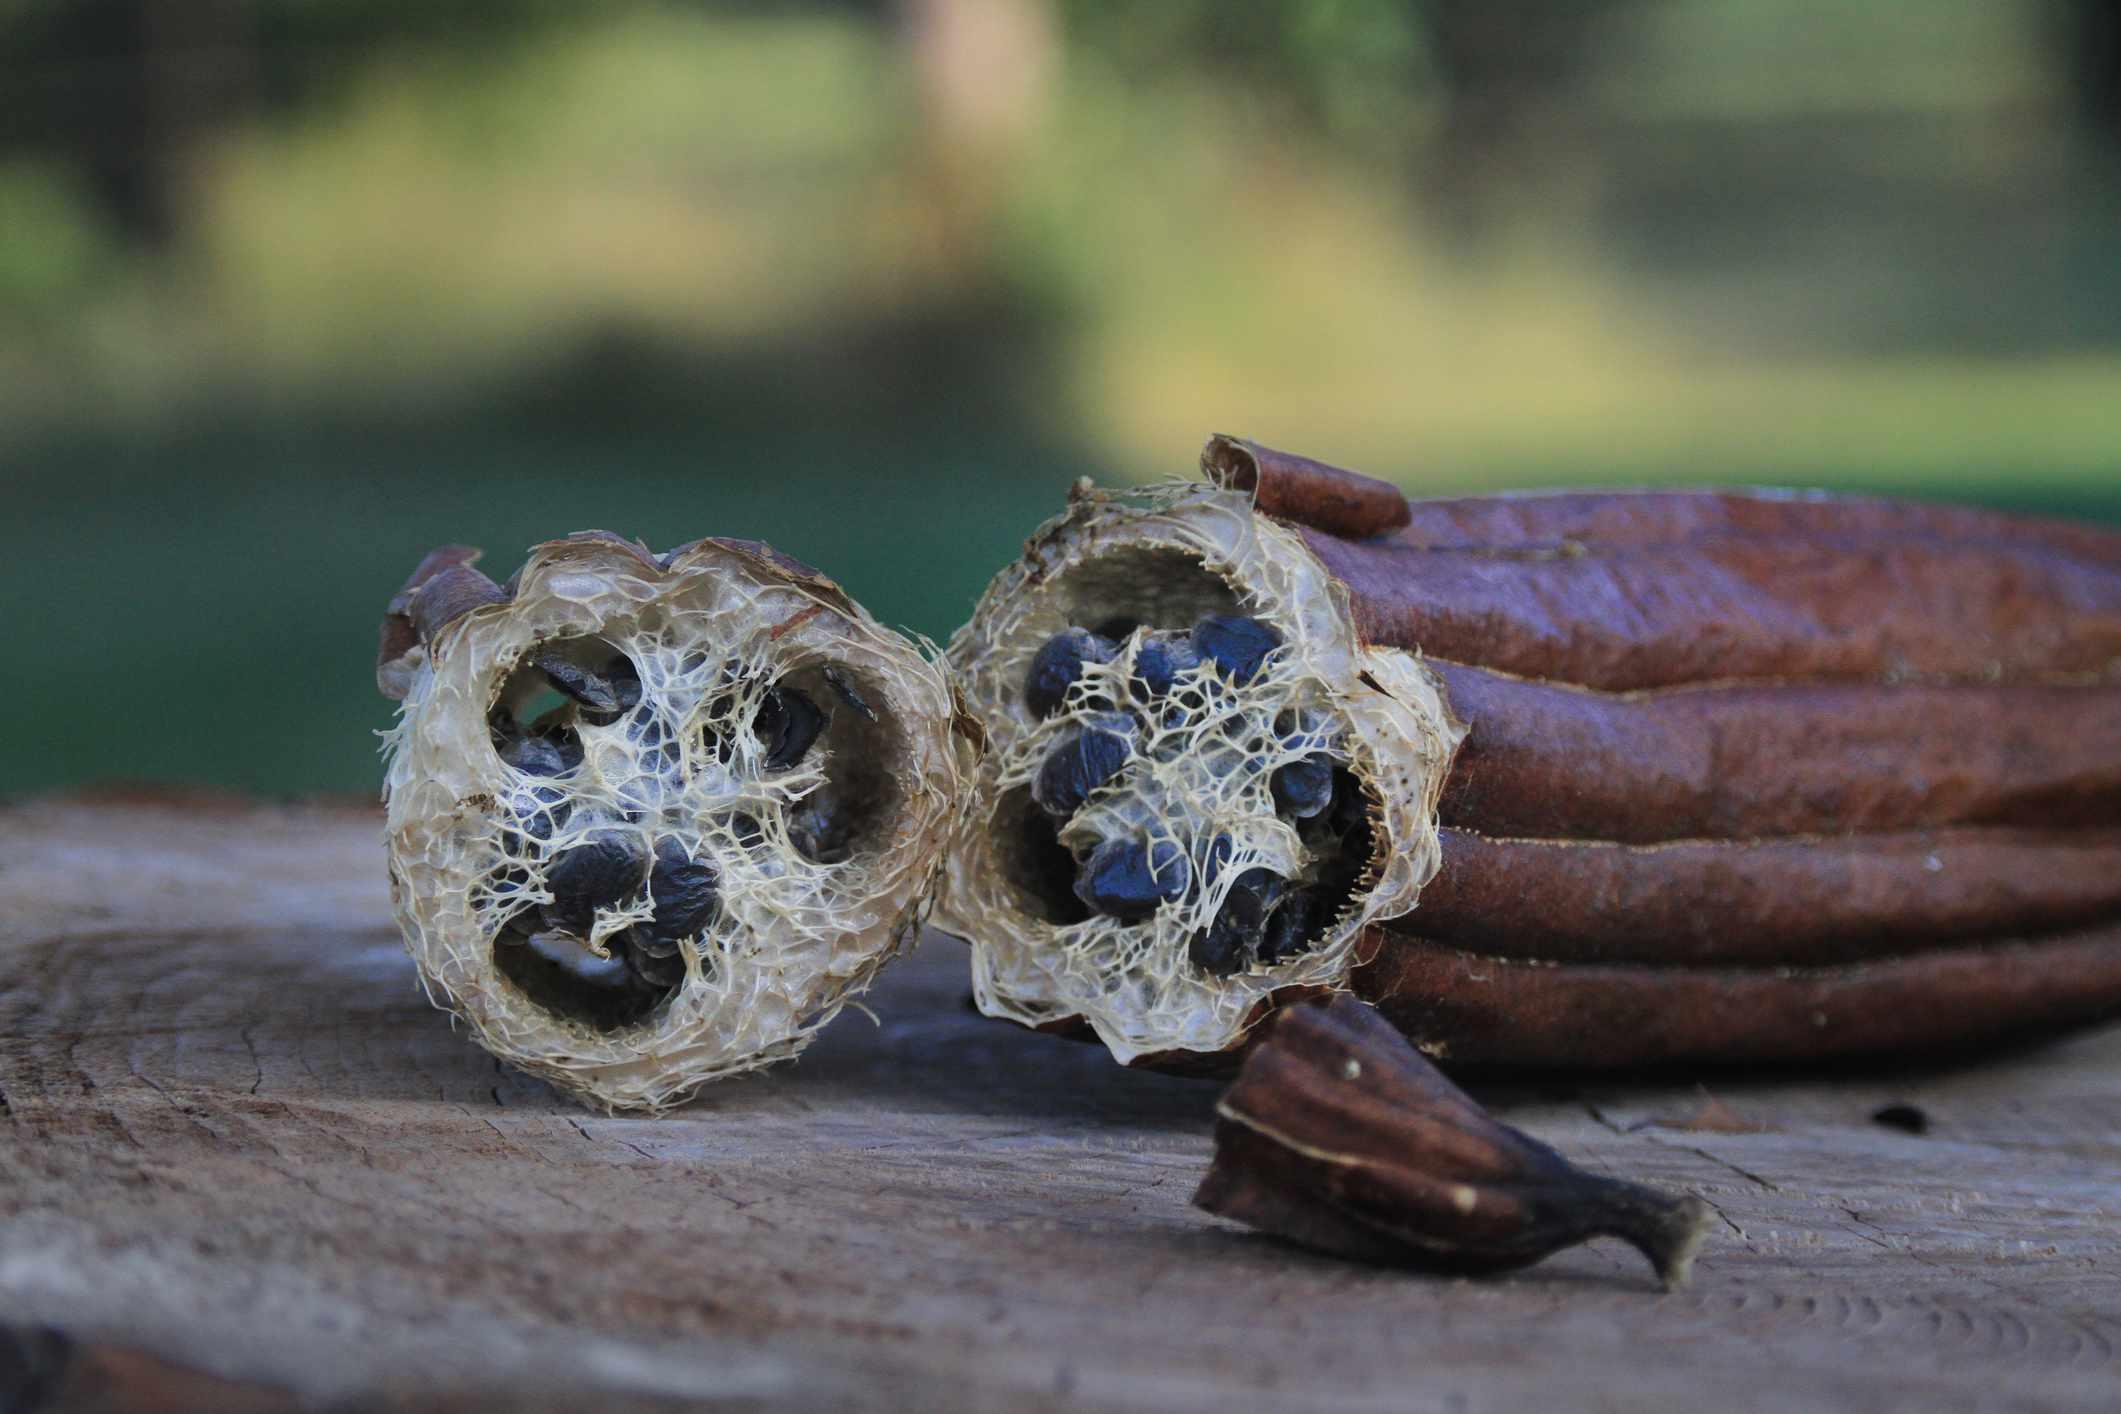 Luffa, Loofa or Loofah gourd with seeds